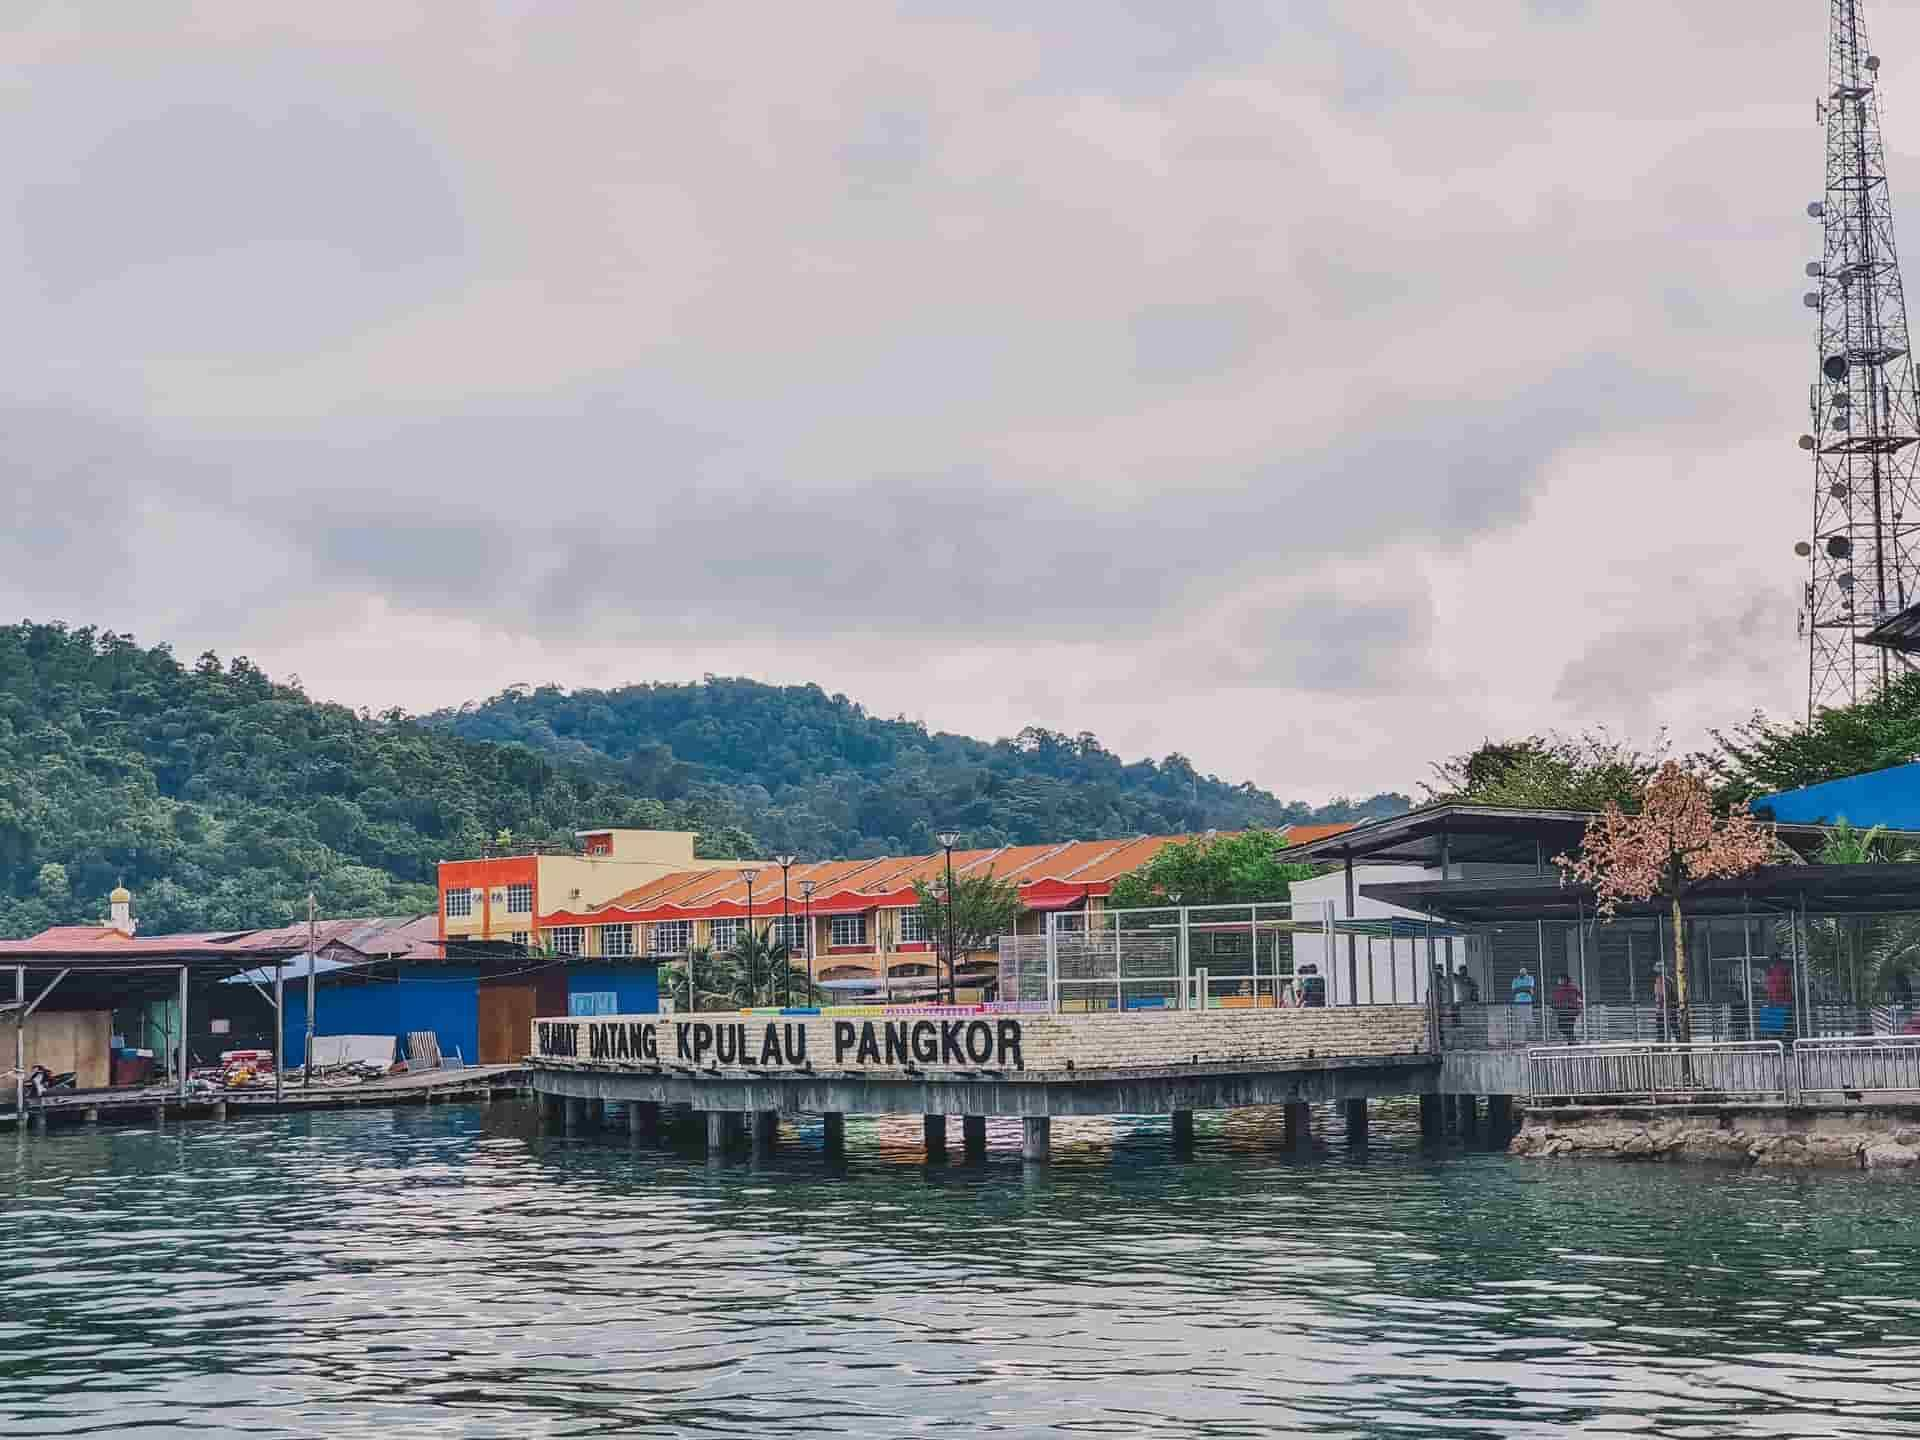 Pulau Pangkor Island Malaysia